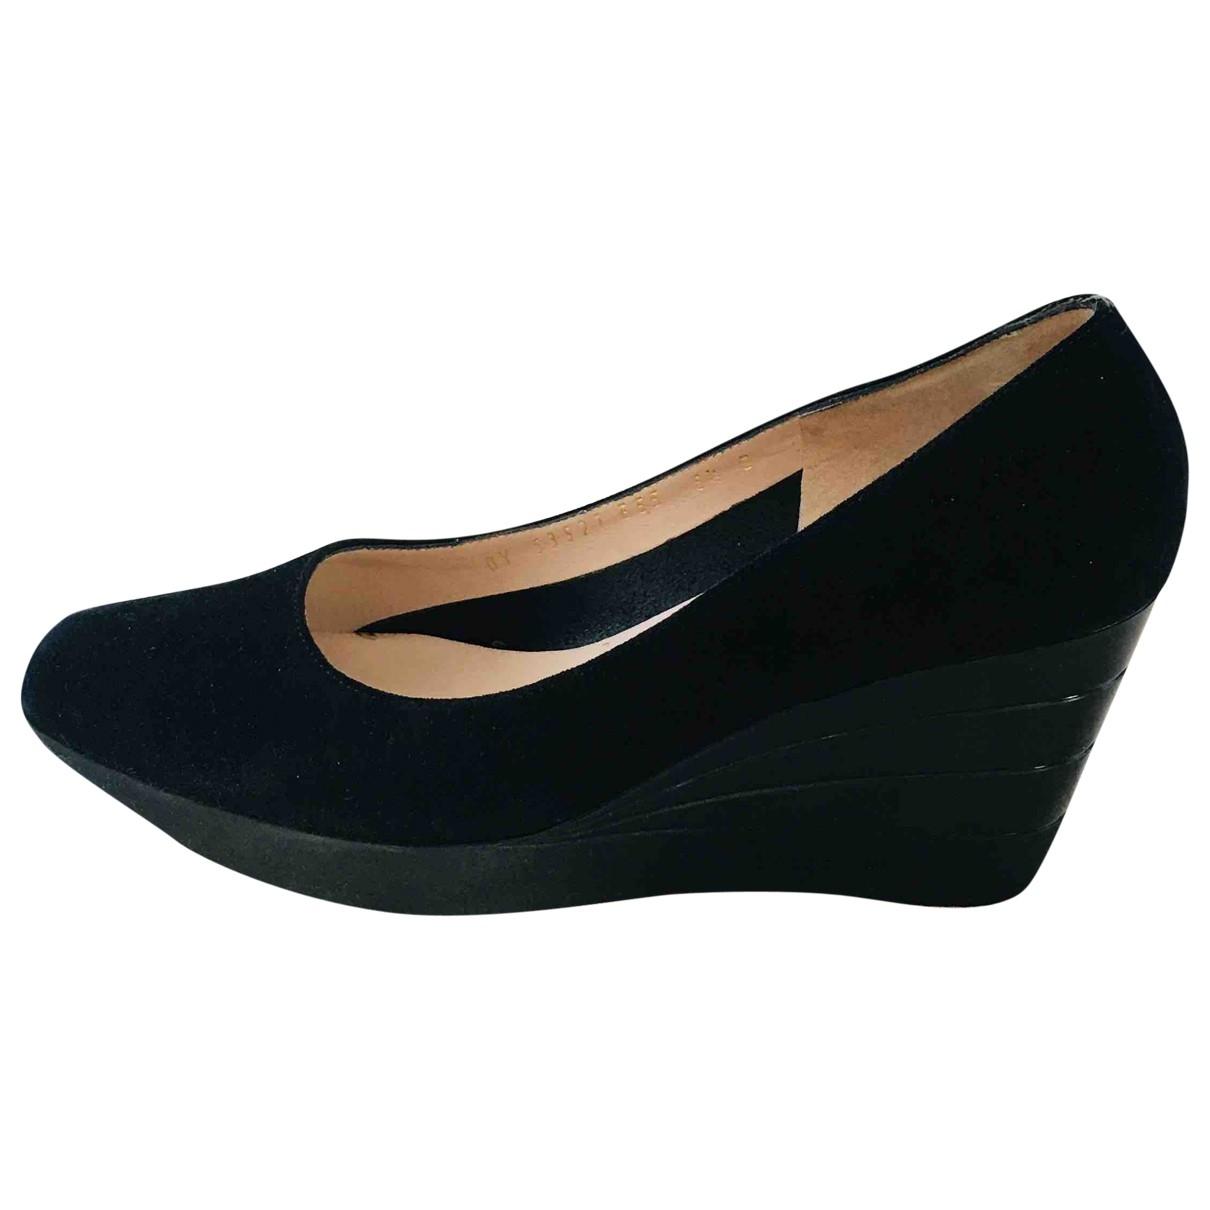 Salvatore Ferragamo \N Black Suede Heels for Women 37 EU